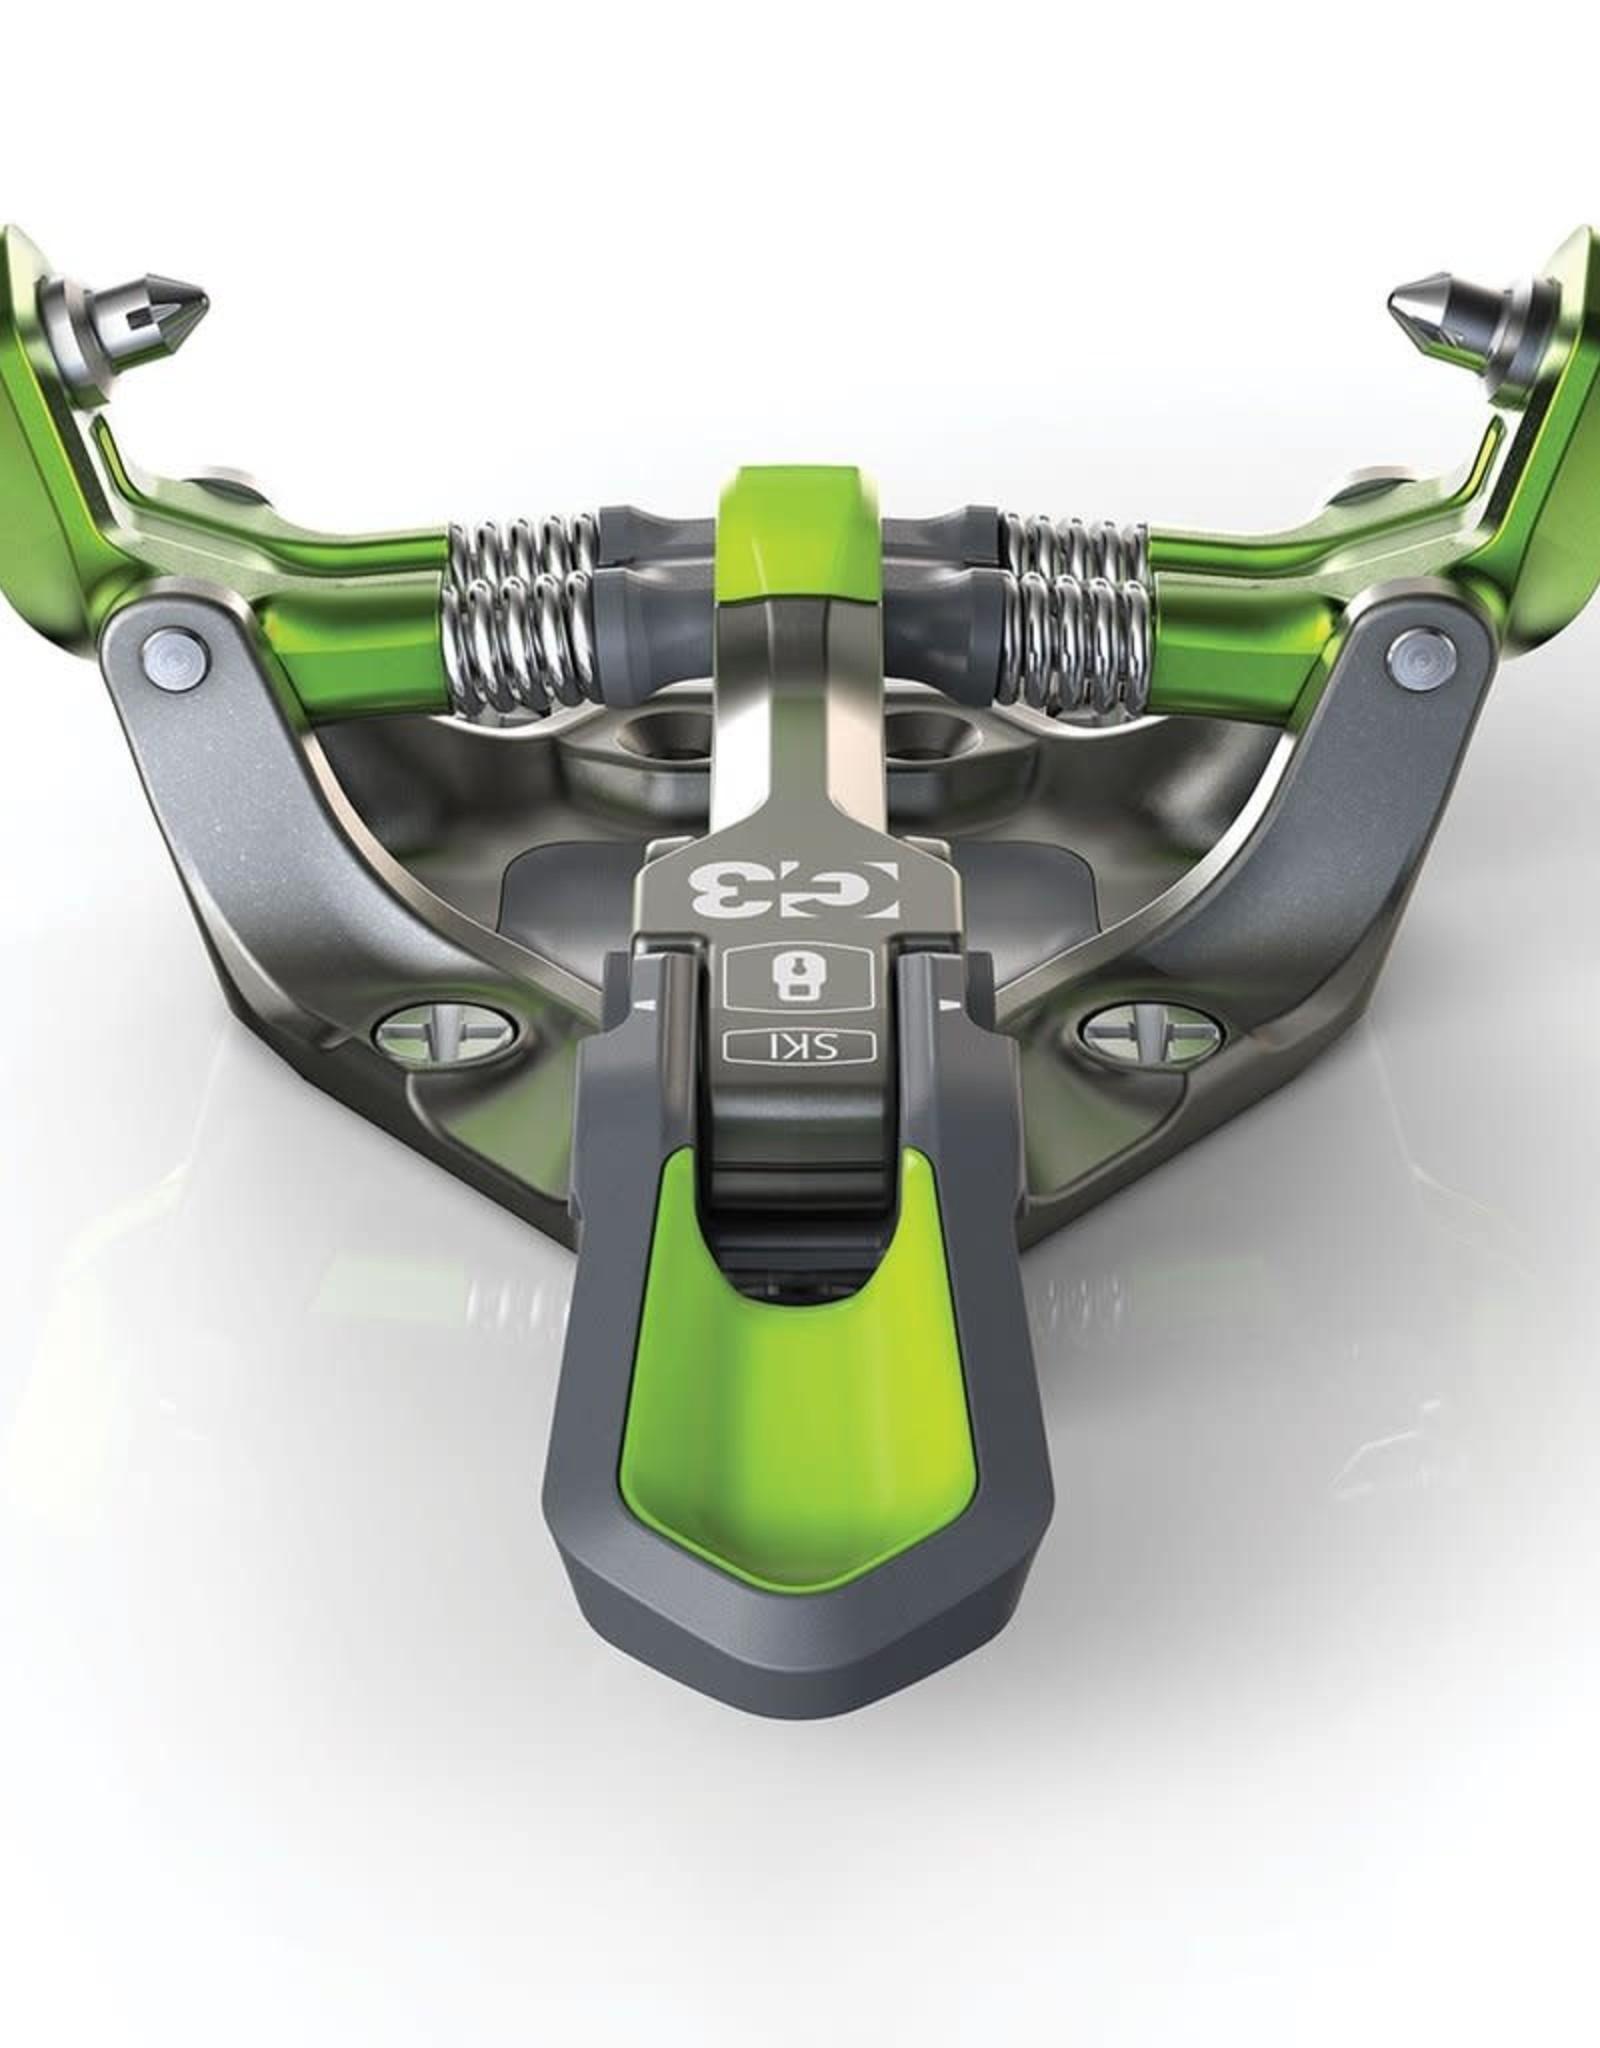 G3 G3 Zed 12 Bindings no brakes F19